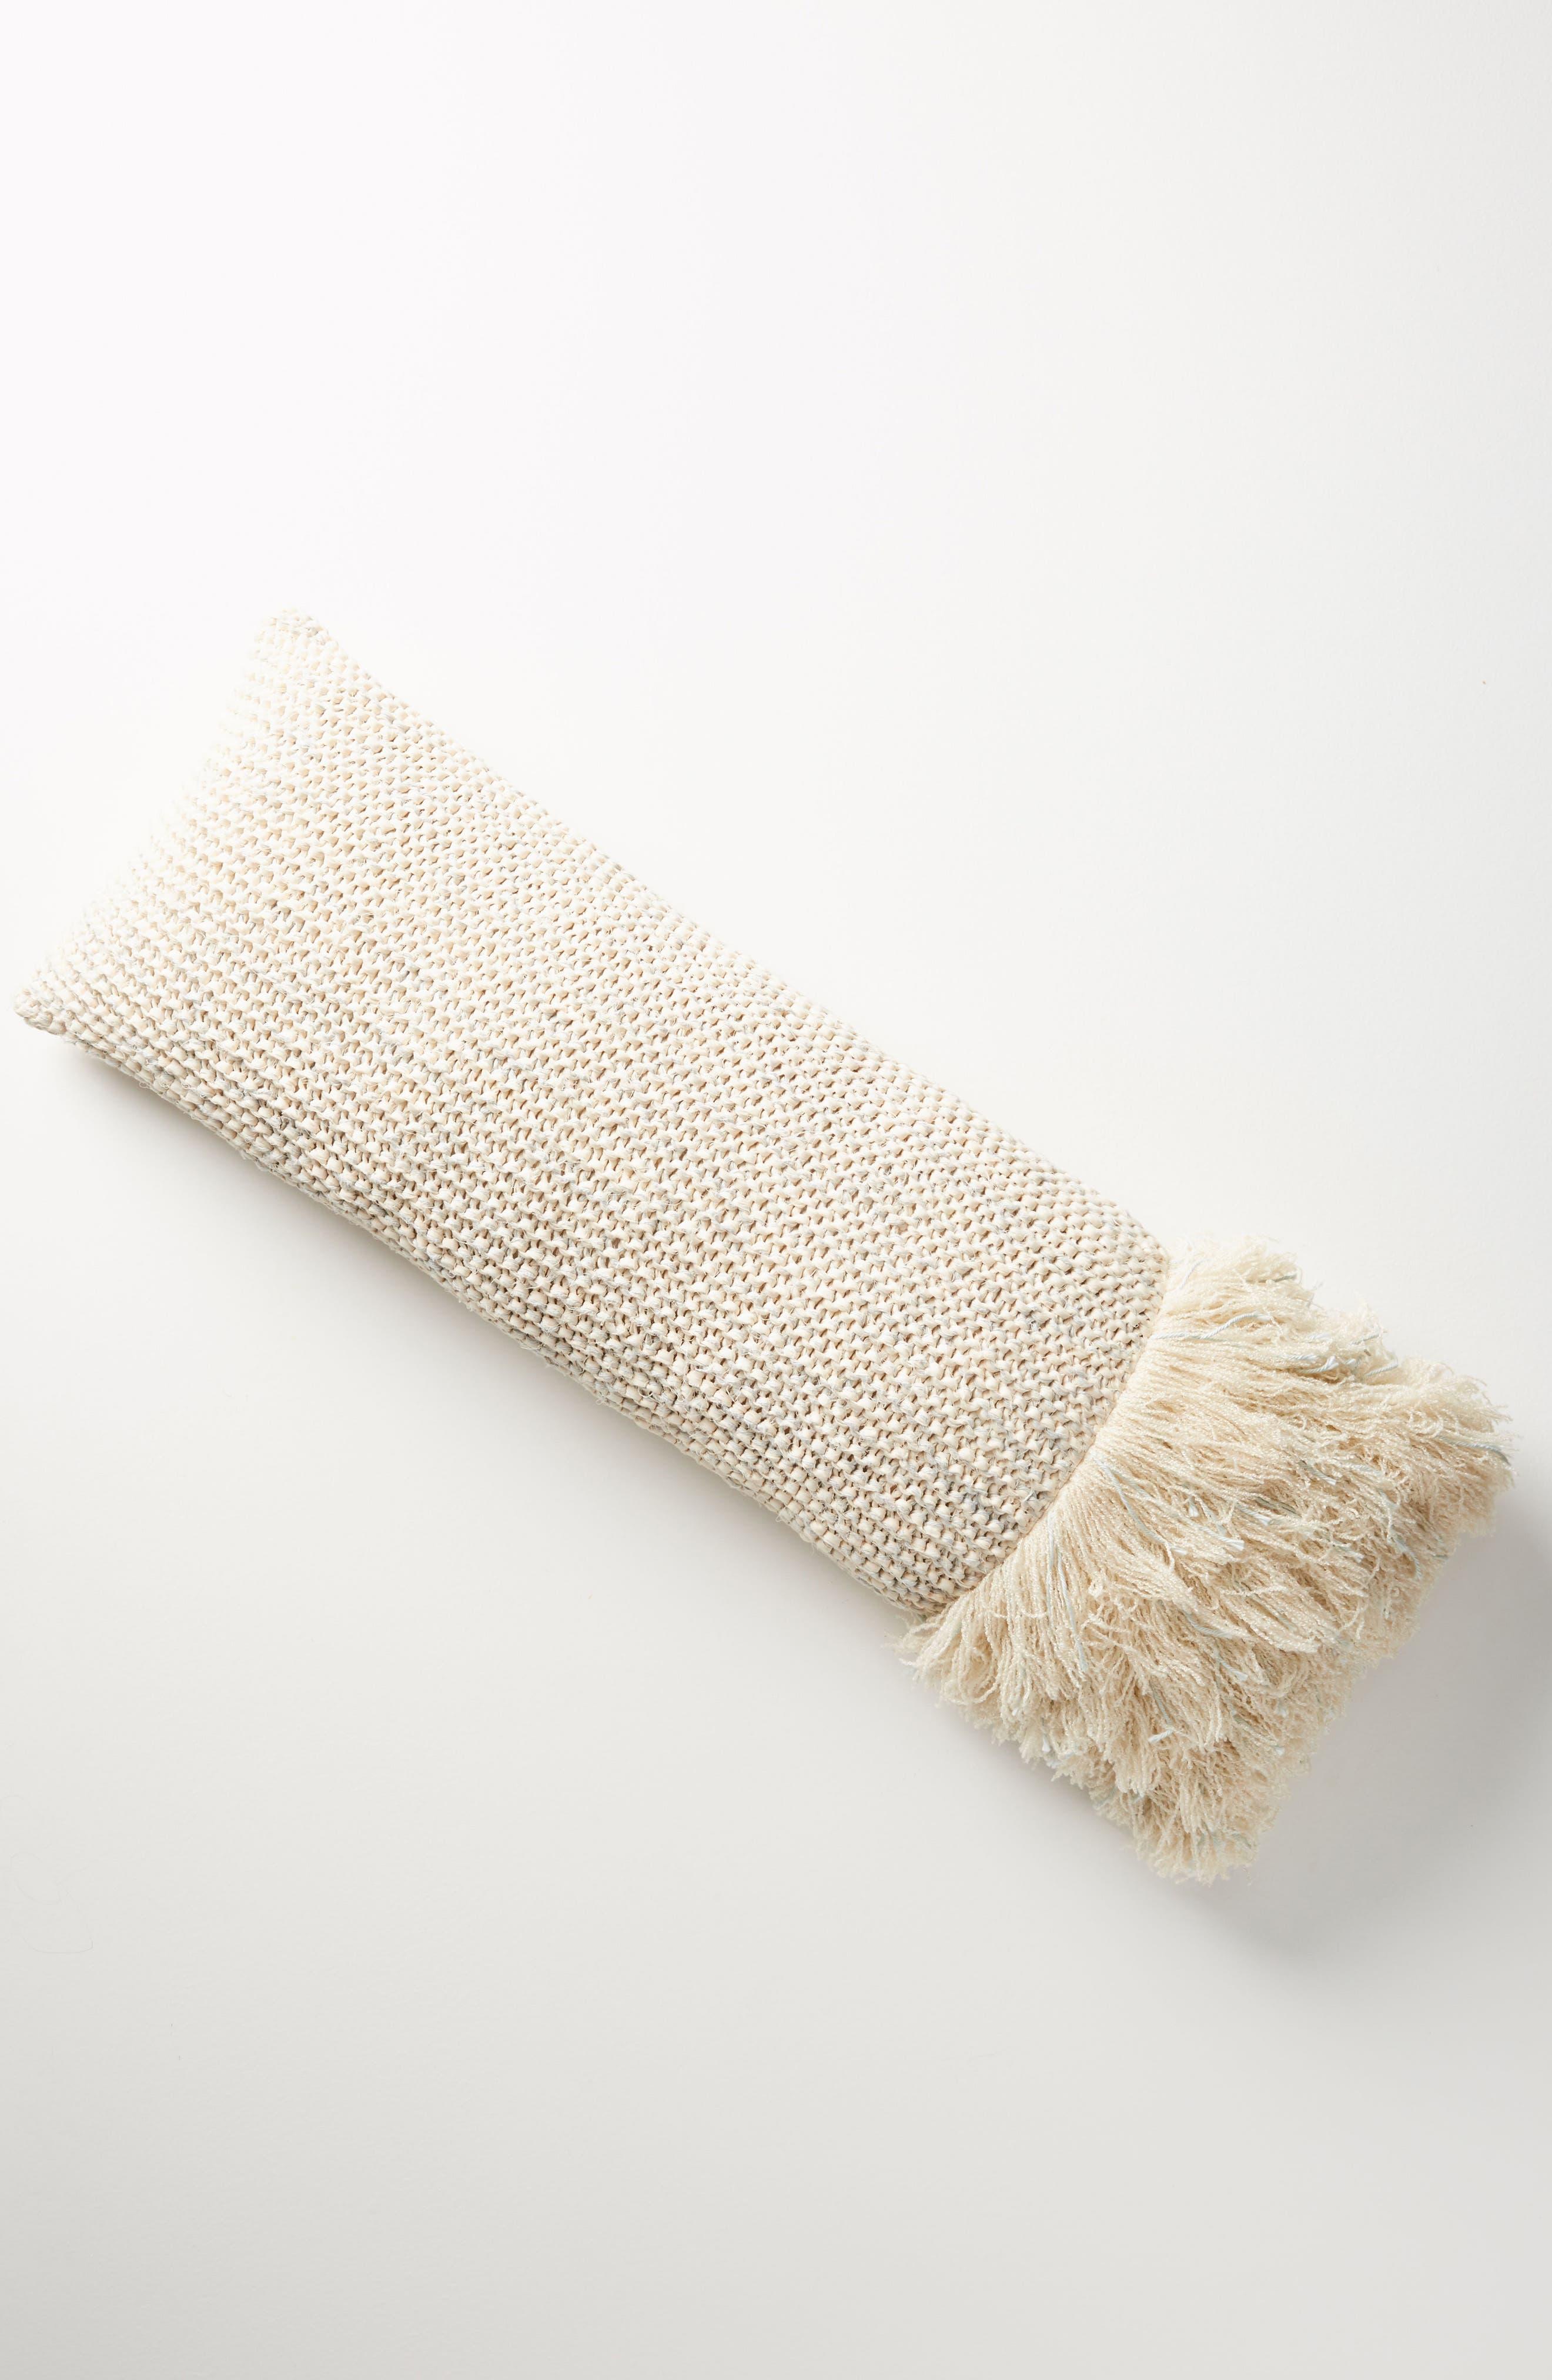 Fringed Waffleknit Pillow,                         Main,                         color, 422